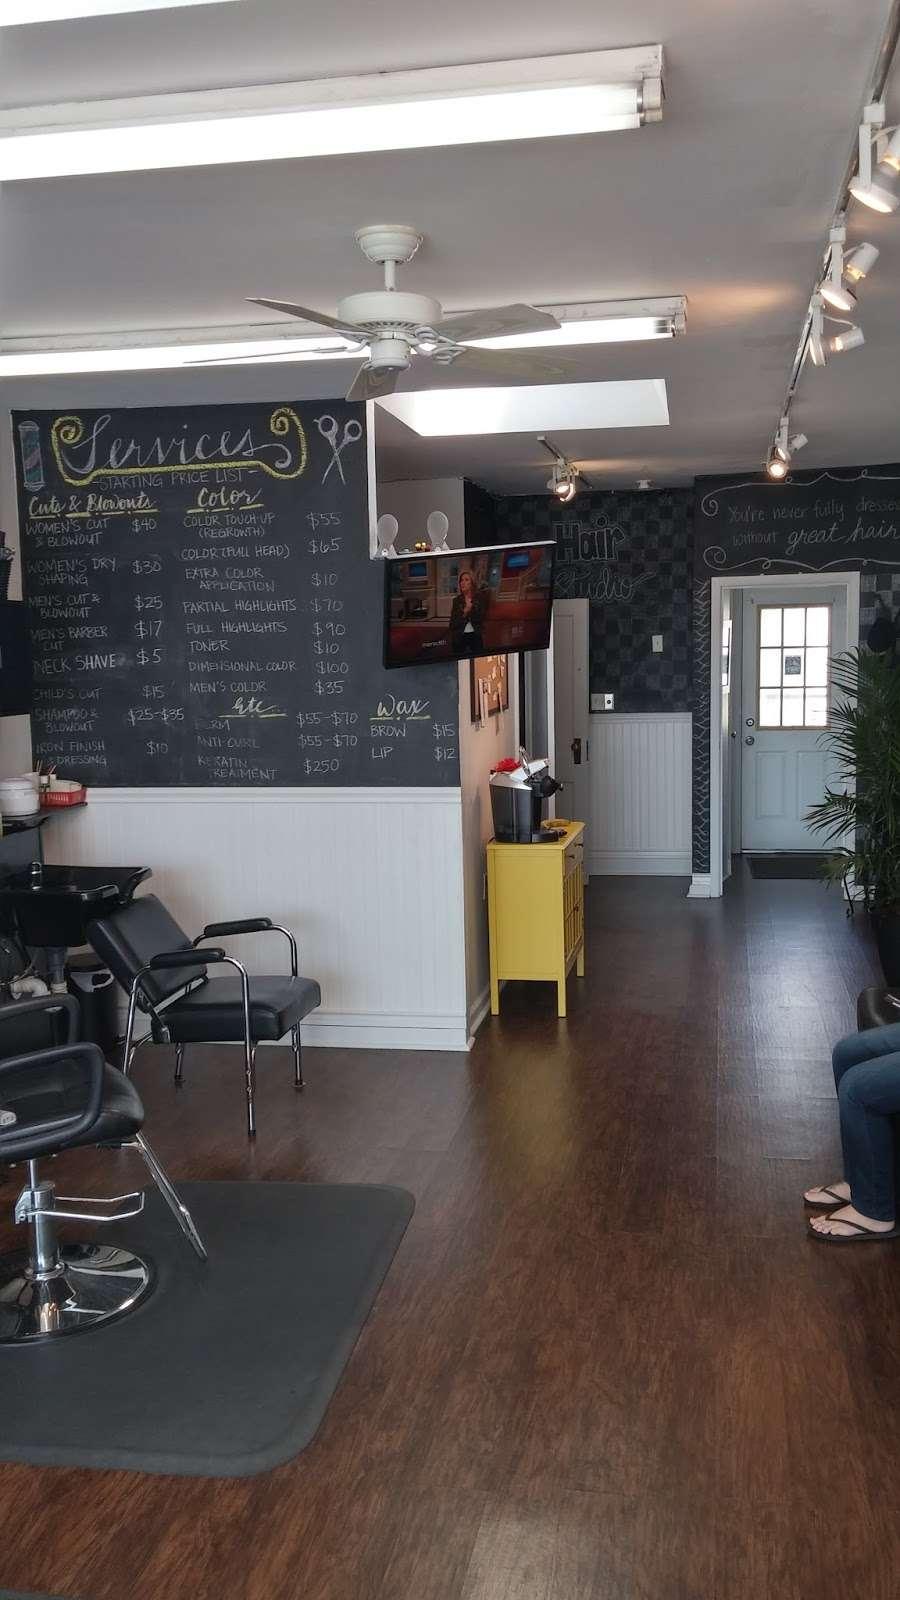 Brian Rocca Hair Studio - hair care  | Photo 5 of 6 | Address: 1644 E Joppa Rd, Towson, MD 21286, USA | Phone: (410) 321-0300